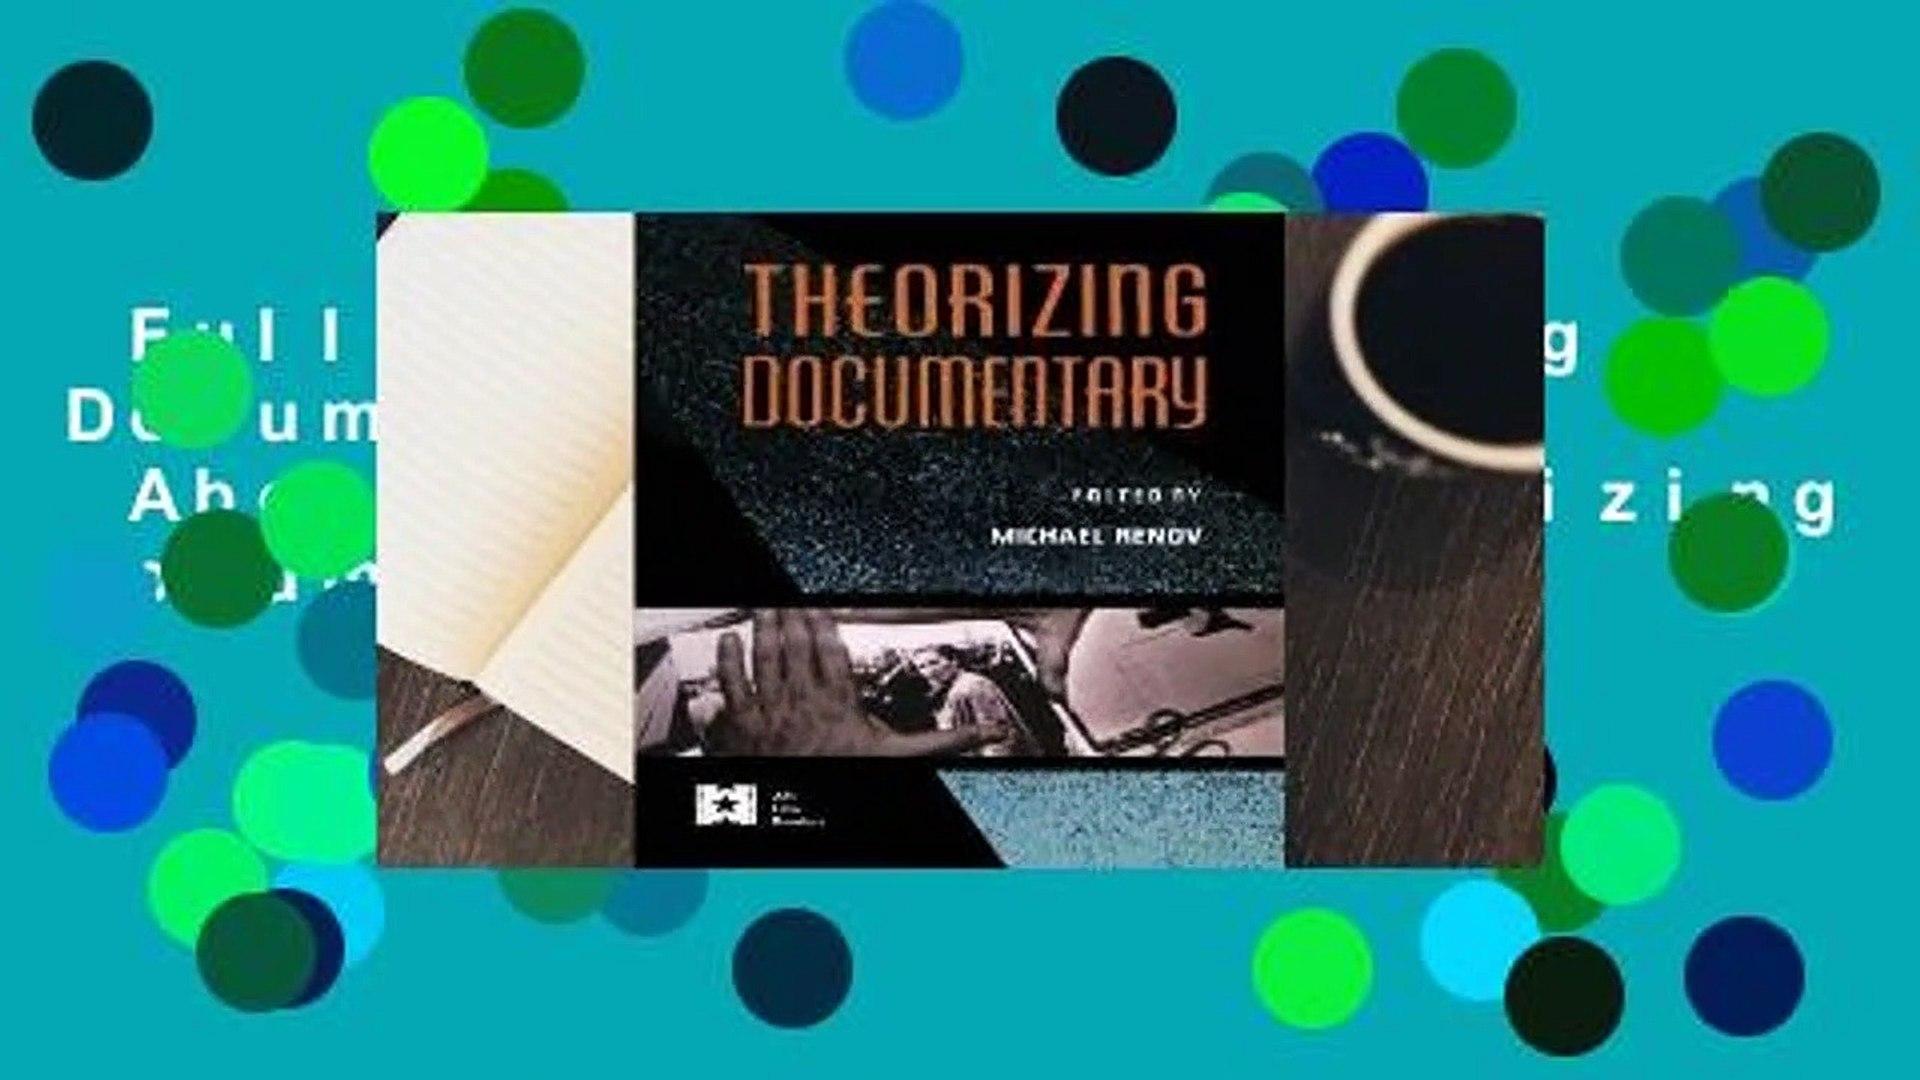 Full E-book  Theorizing Documentary Complete  About For Books  Theorizing Documentary  Review